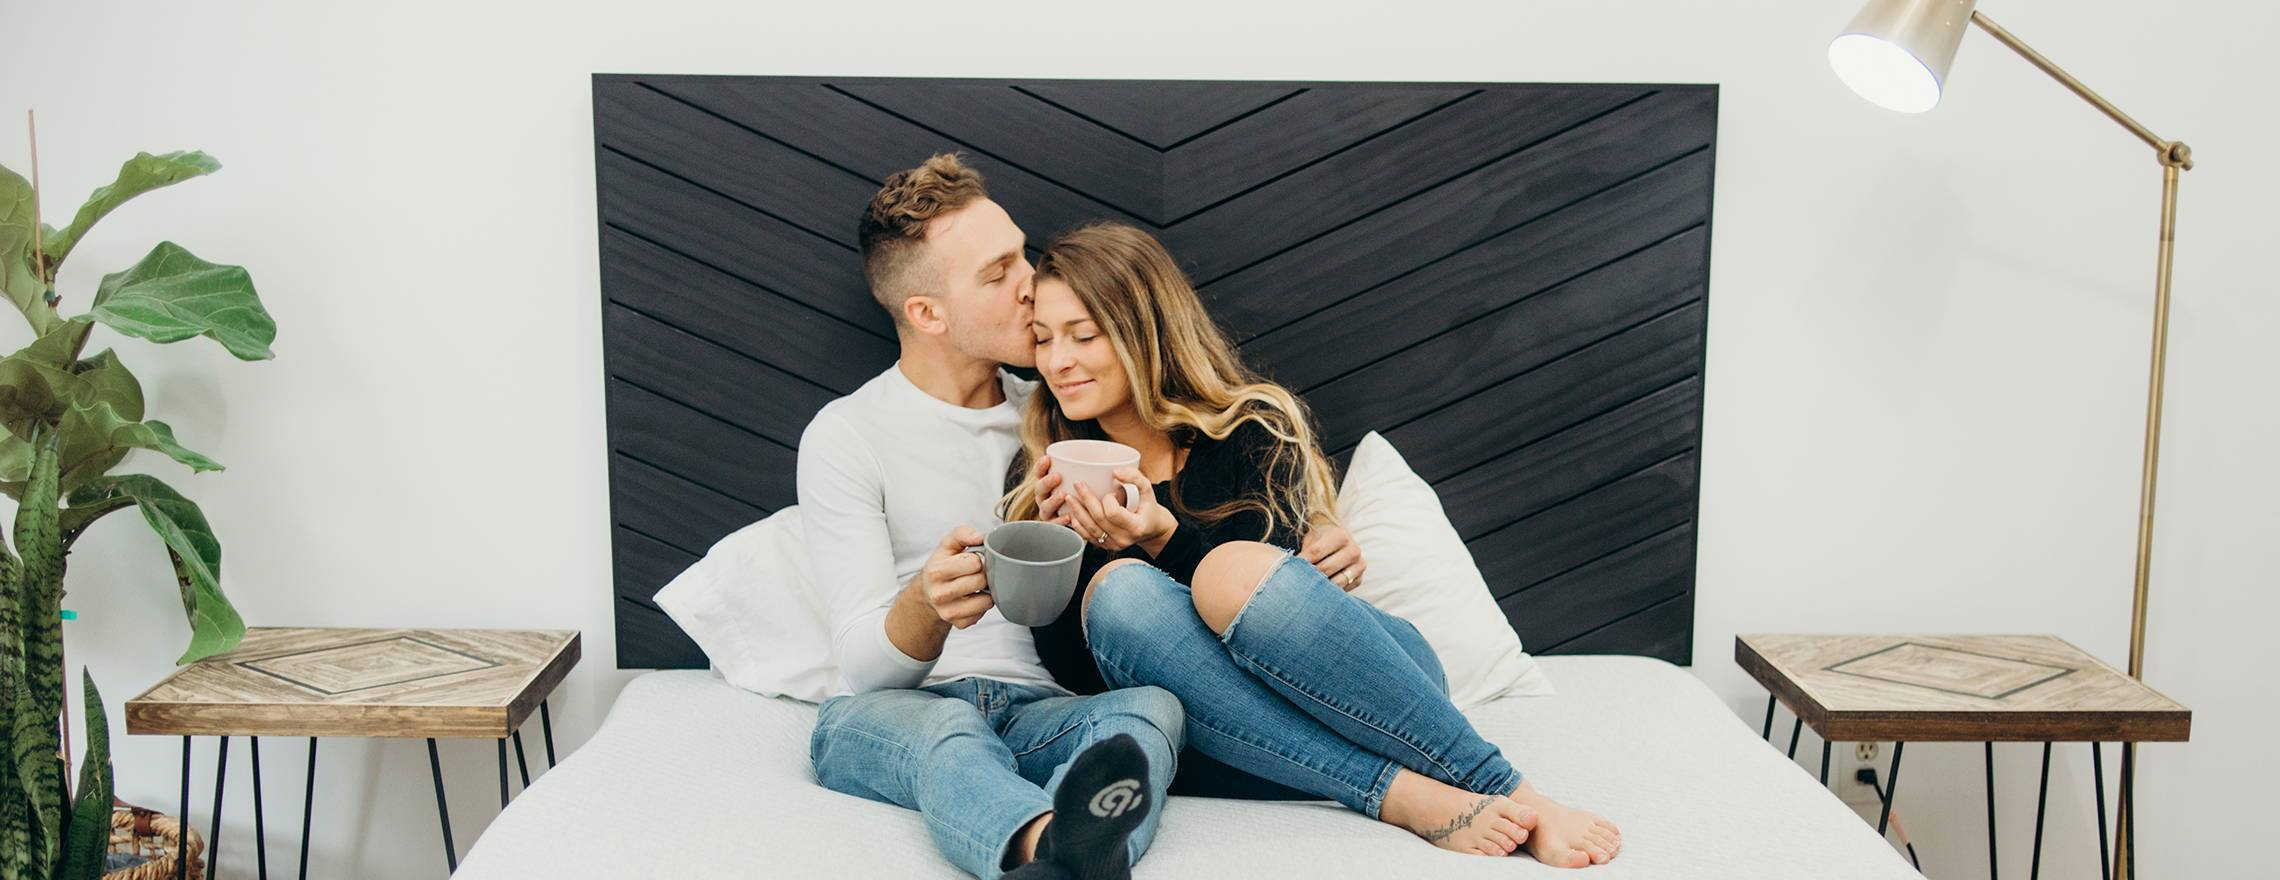 sweet_couple_on_a_leesa_mattress_with_coffee_1